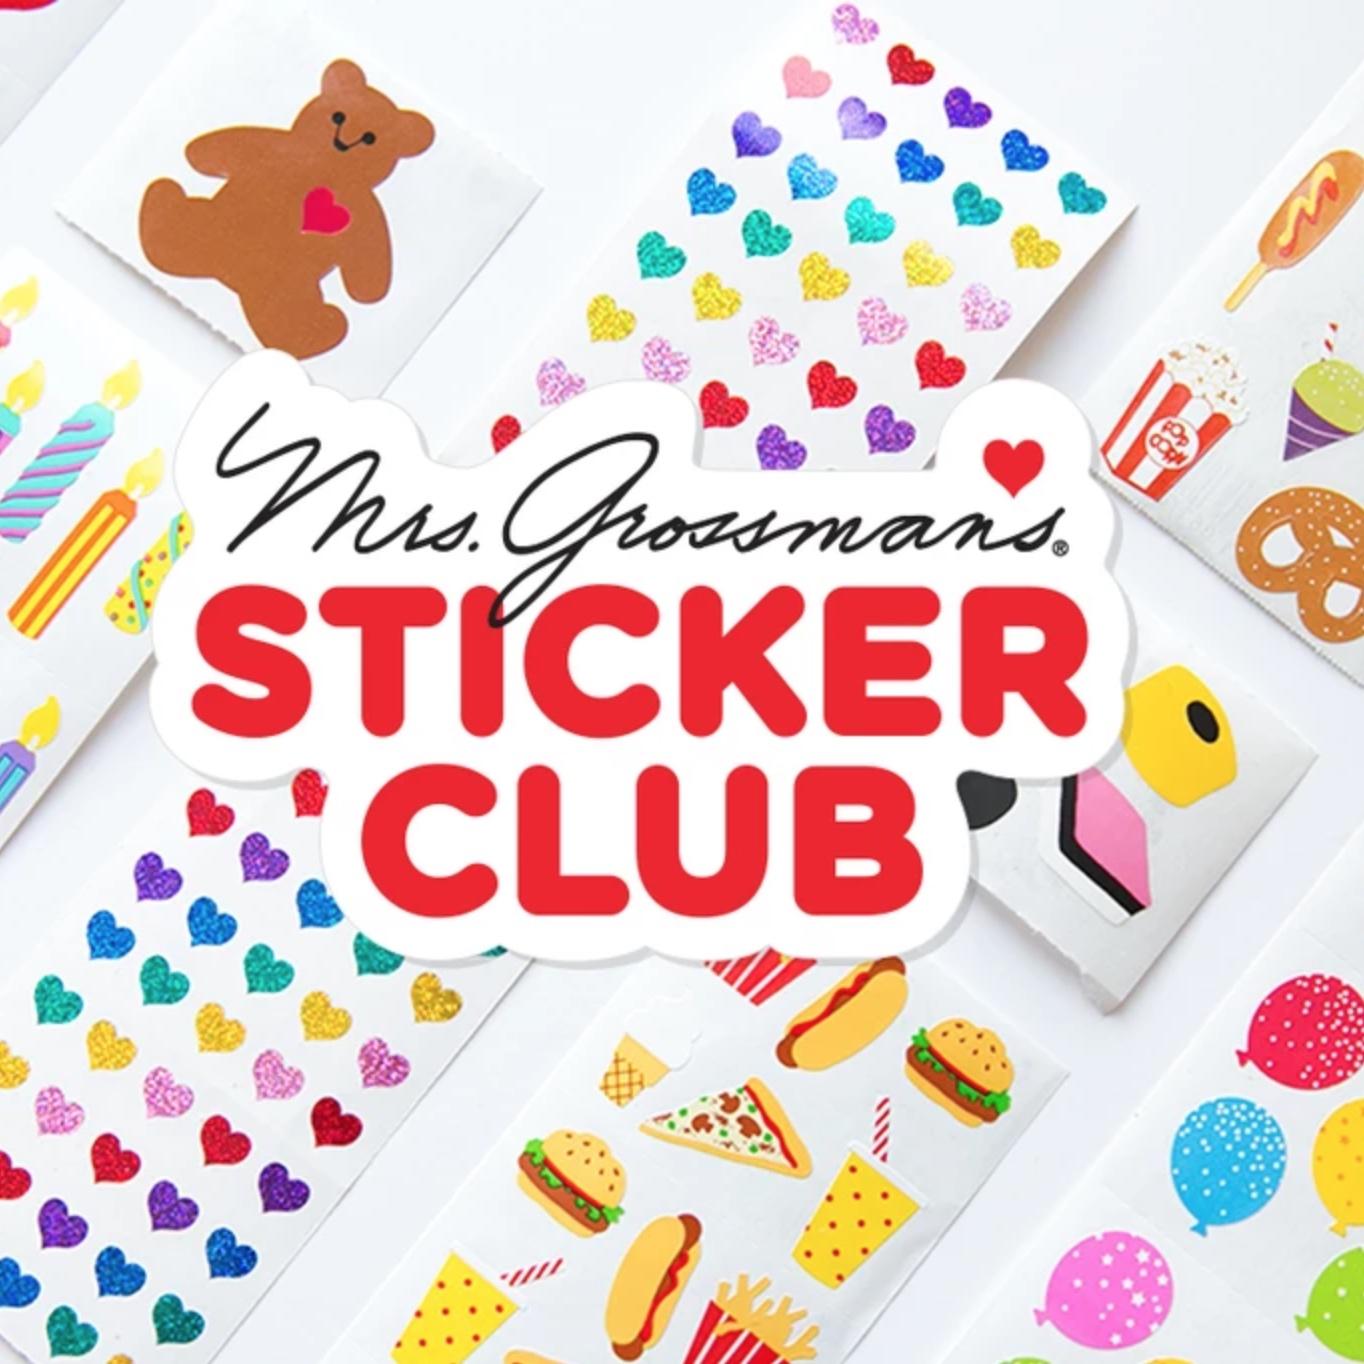 Mrs Grossman's Sticker Club